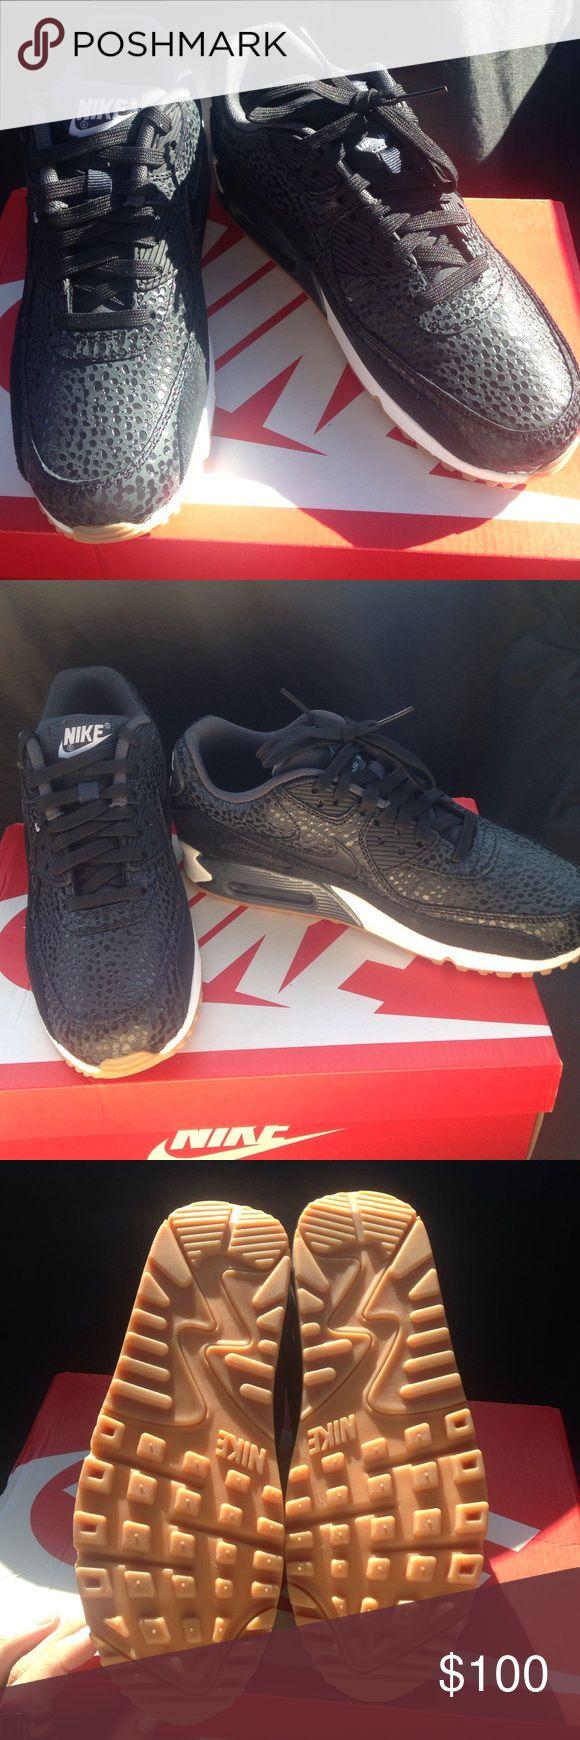 Nike Air Max 90 Black on black leopard print. White and tan sole. NWT